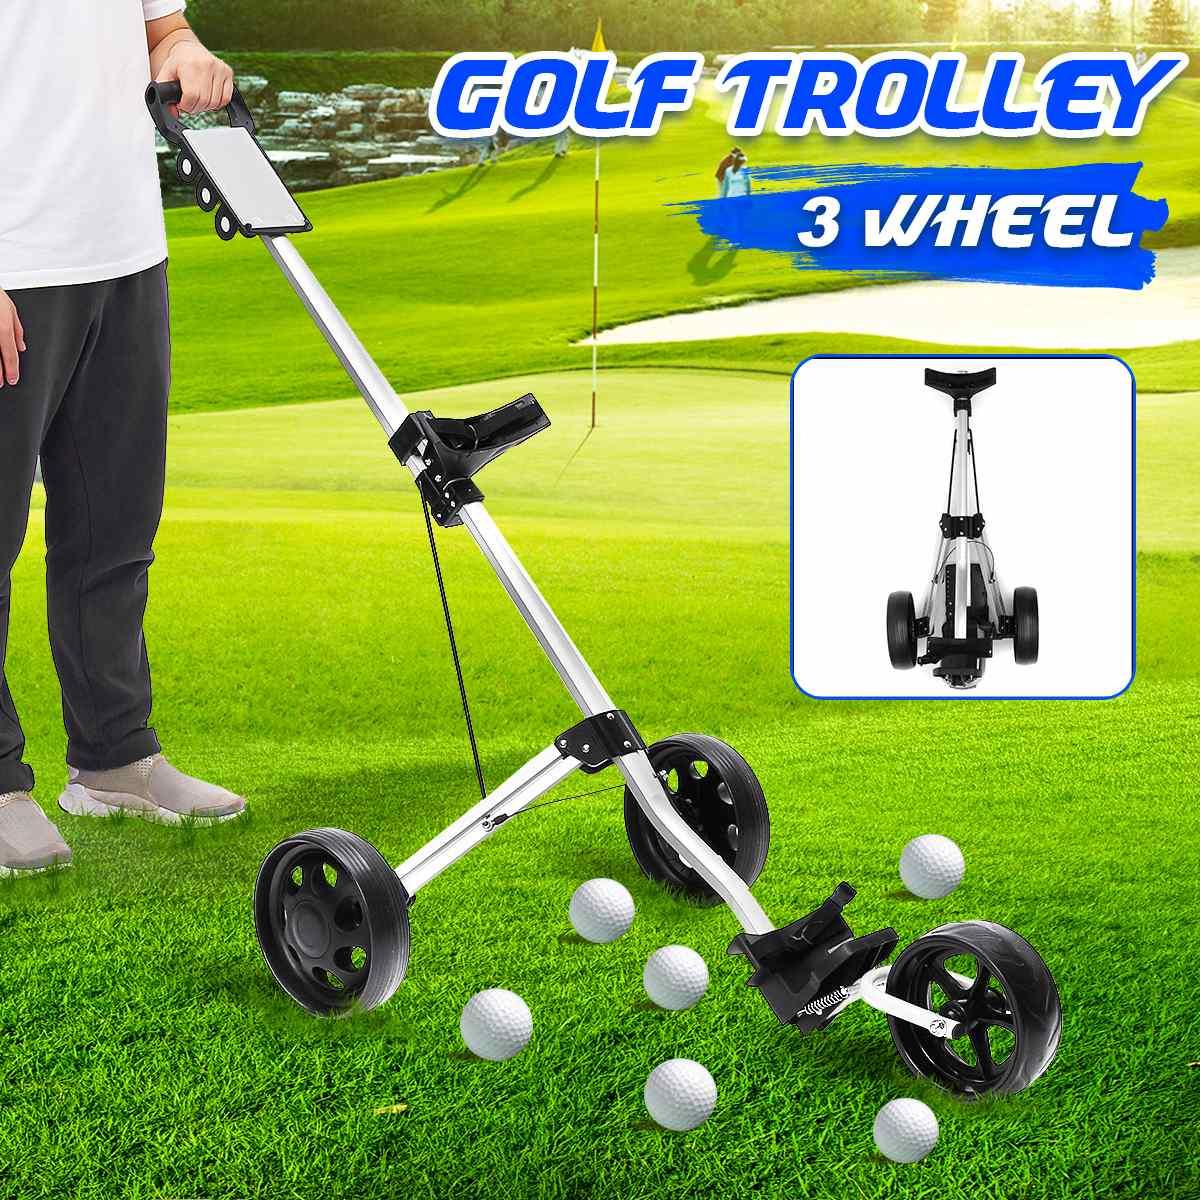 Golf Pull Cart Iron Black Adjustable Golf Trolley Cart 3 Wheels Push Pull Golf Cart Aluminium Alloy Foldable Manual Golf Trolley 1